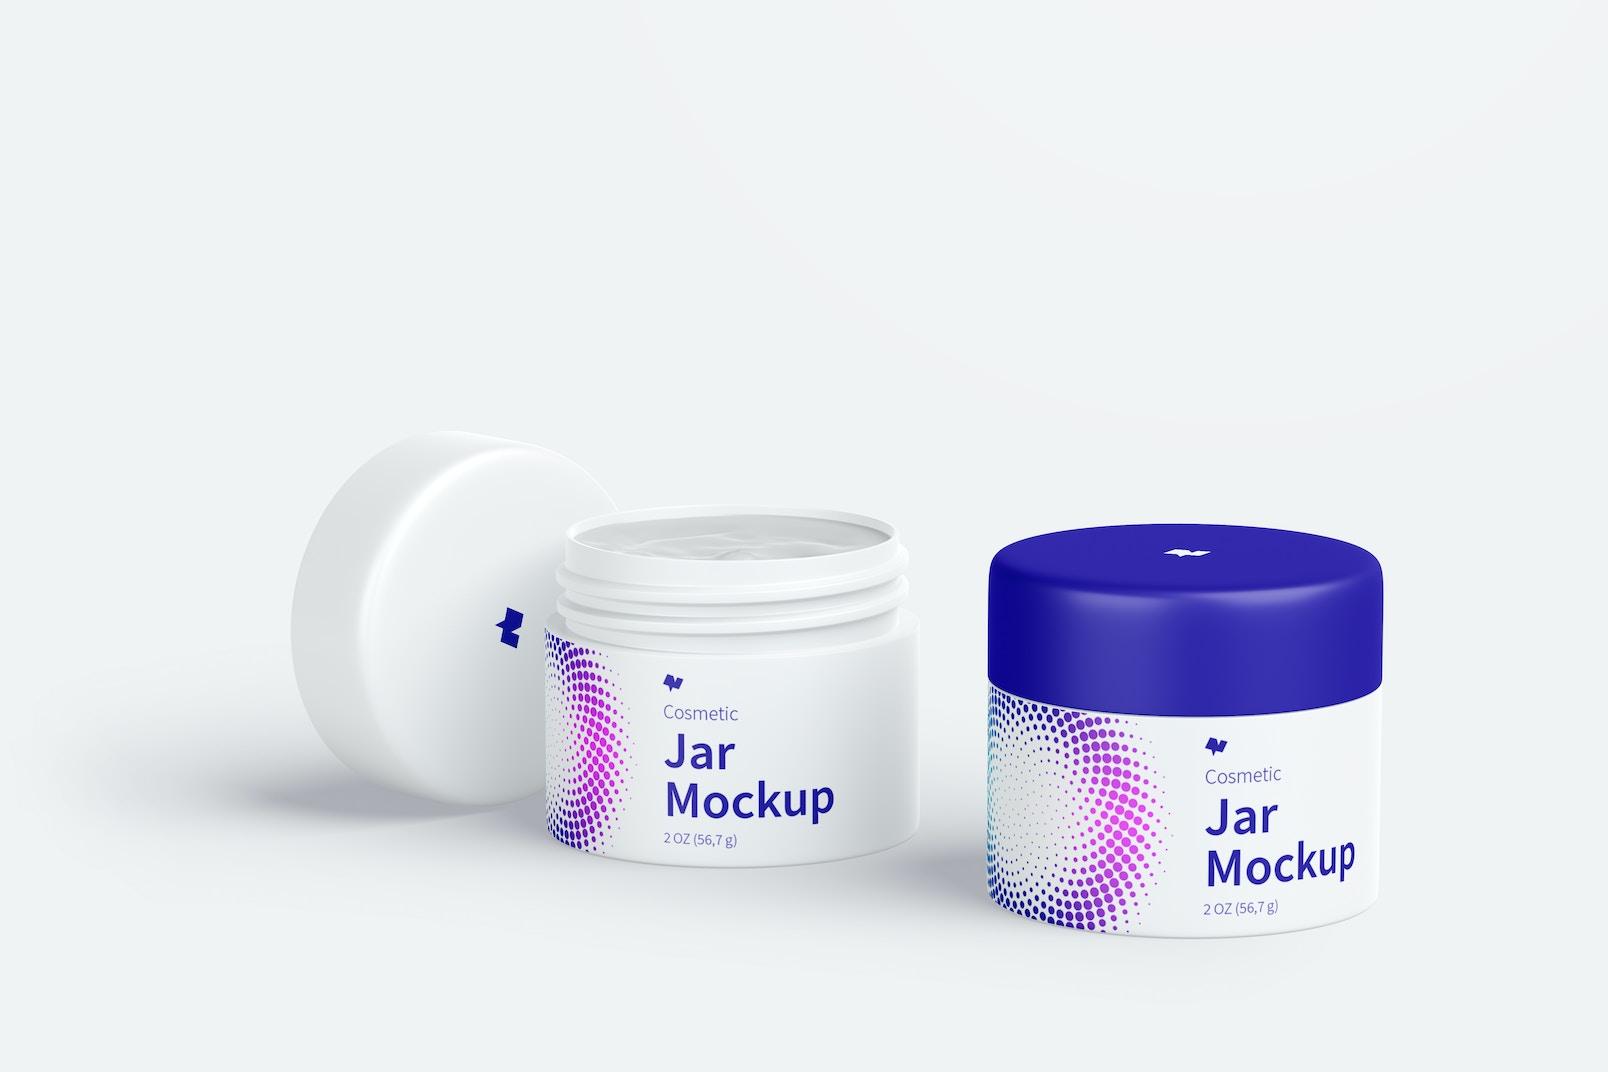 Cosmetic Jar Mockup 02